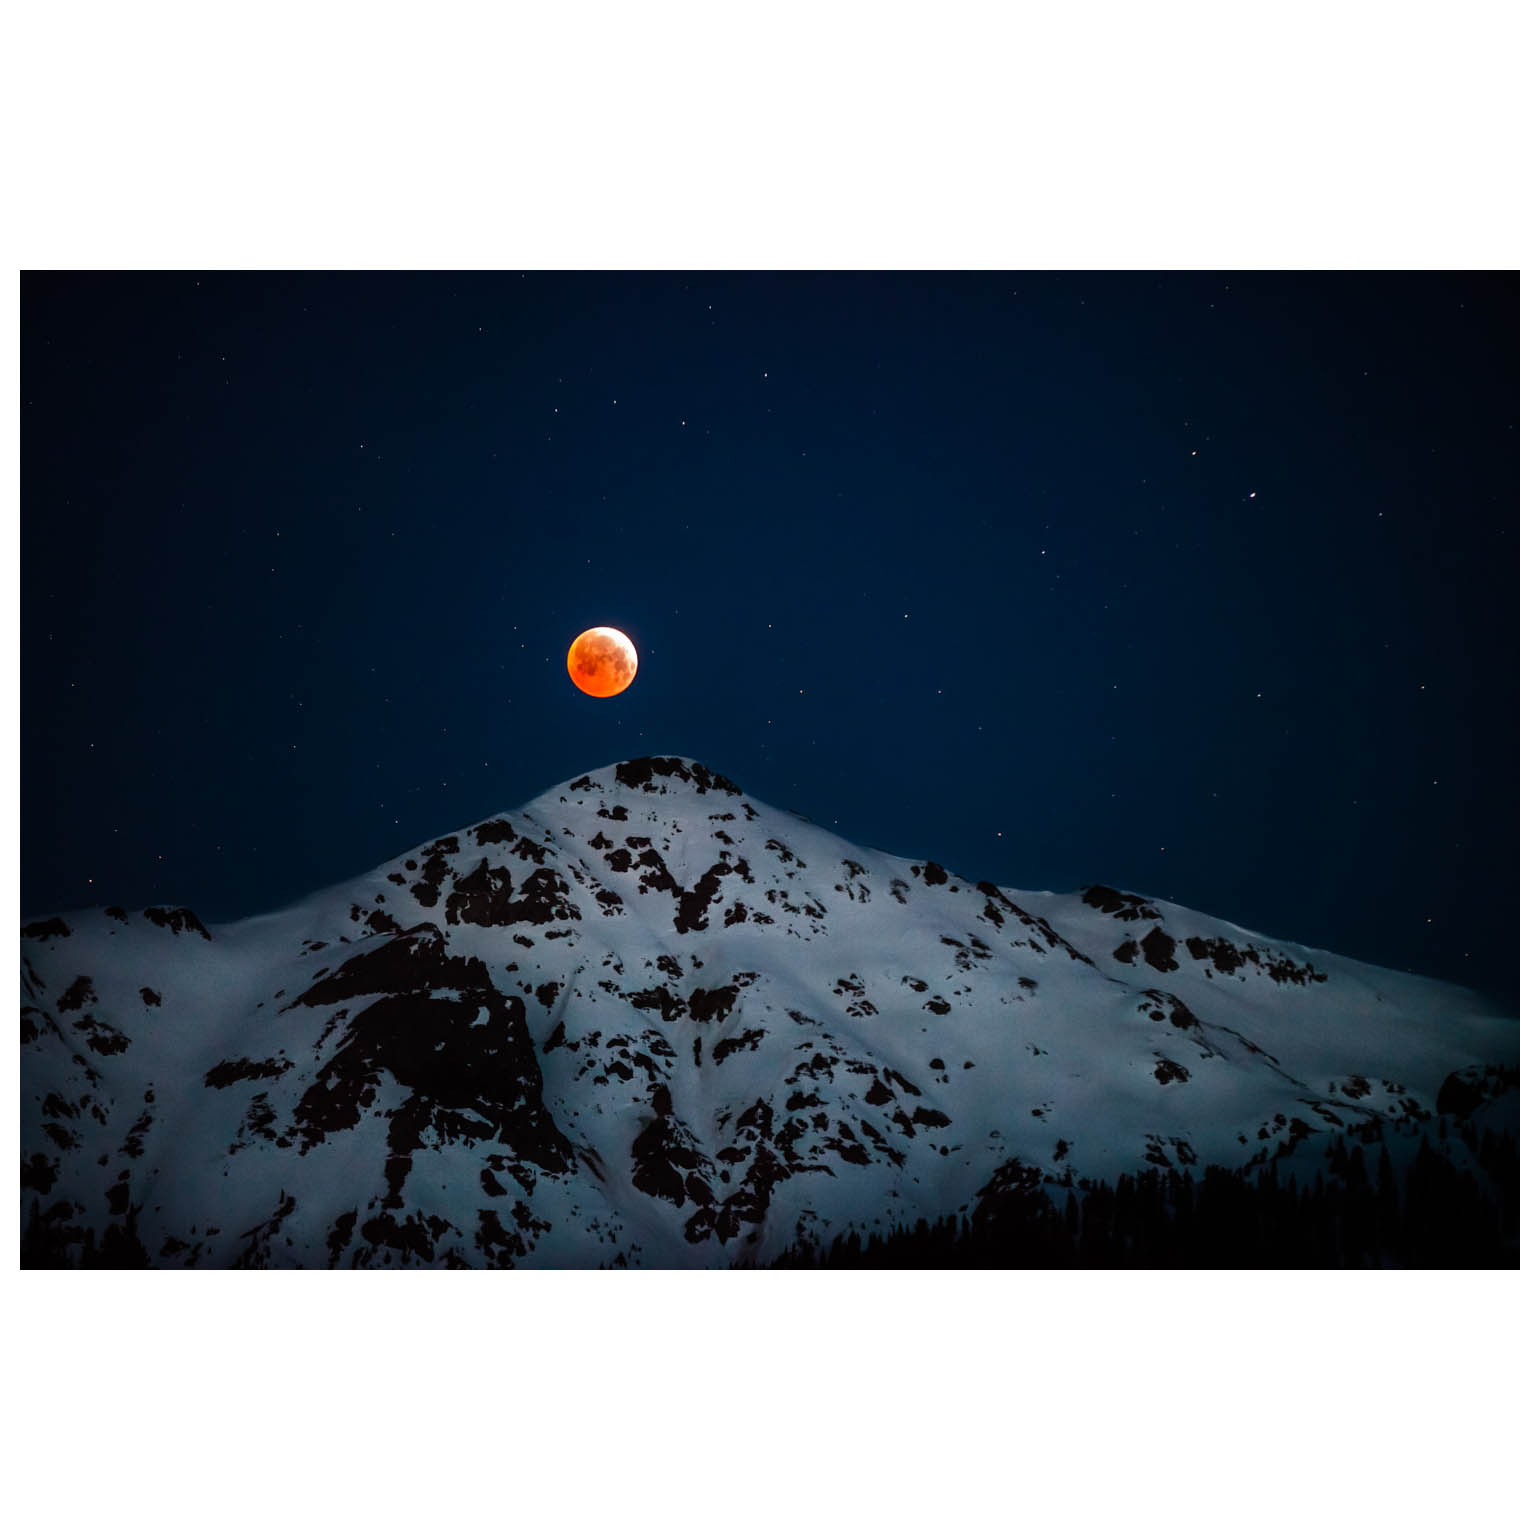 Cullis unframed - Lunar Eclipse cropped 2